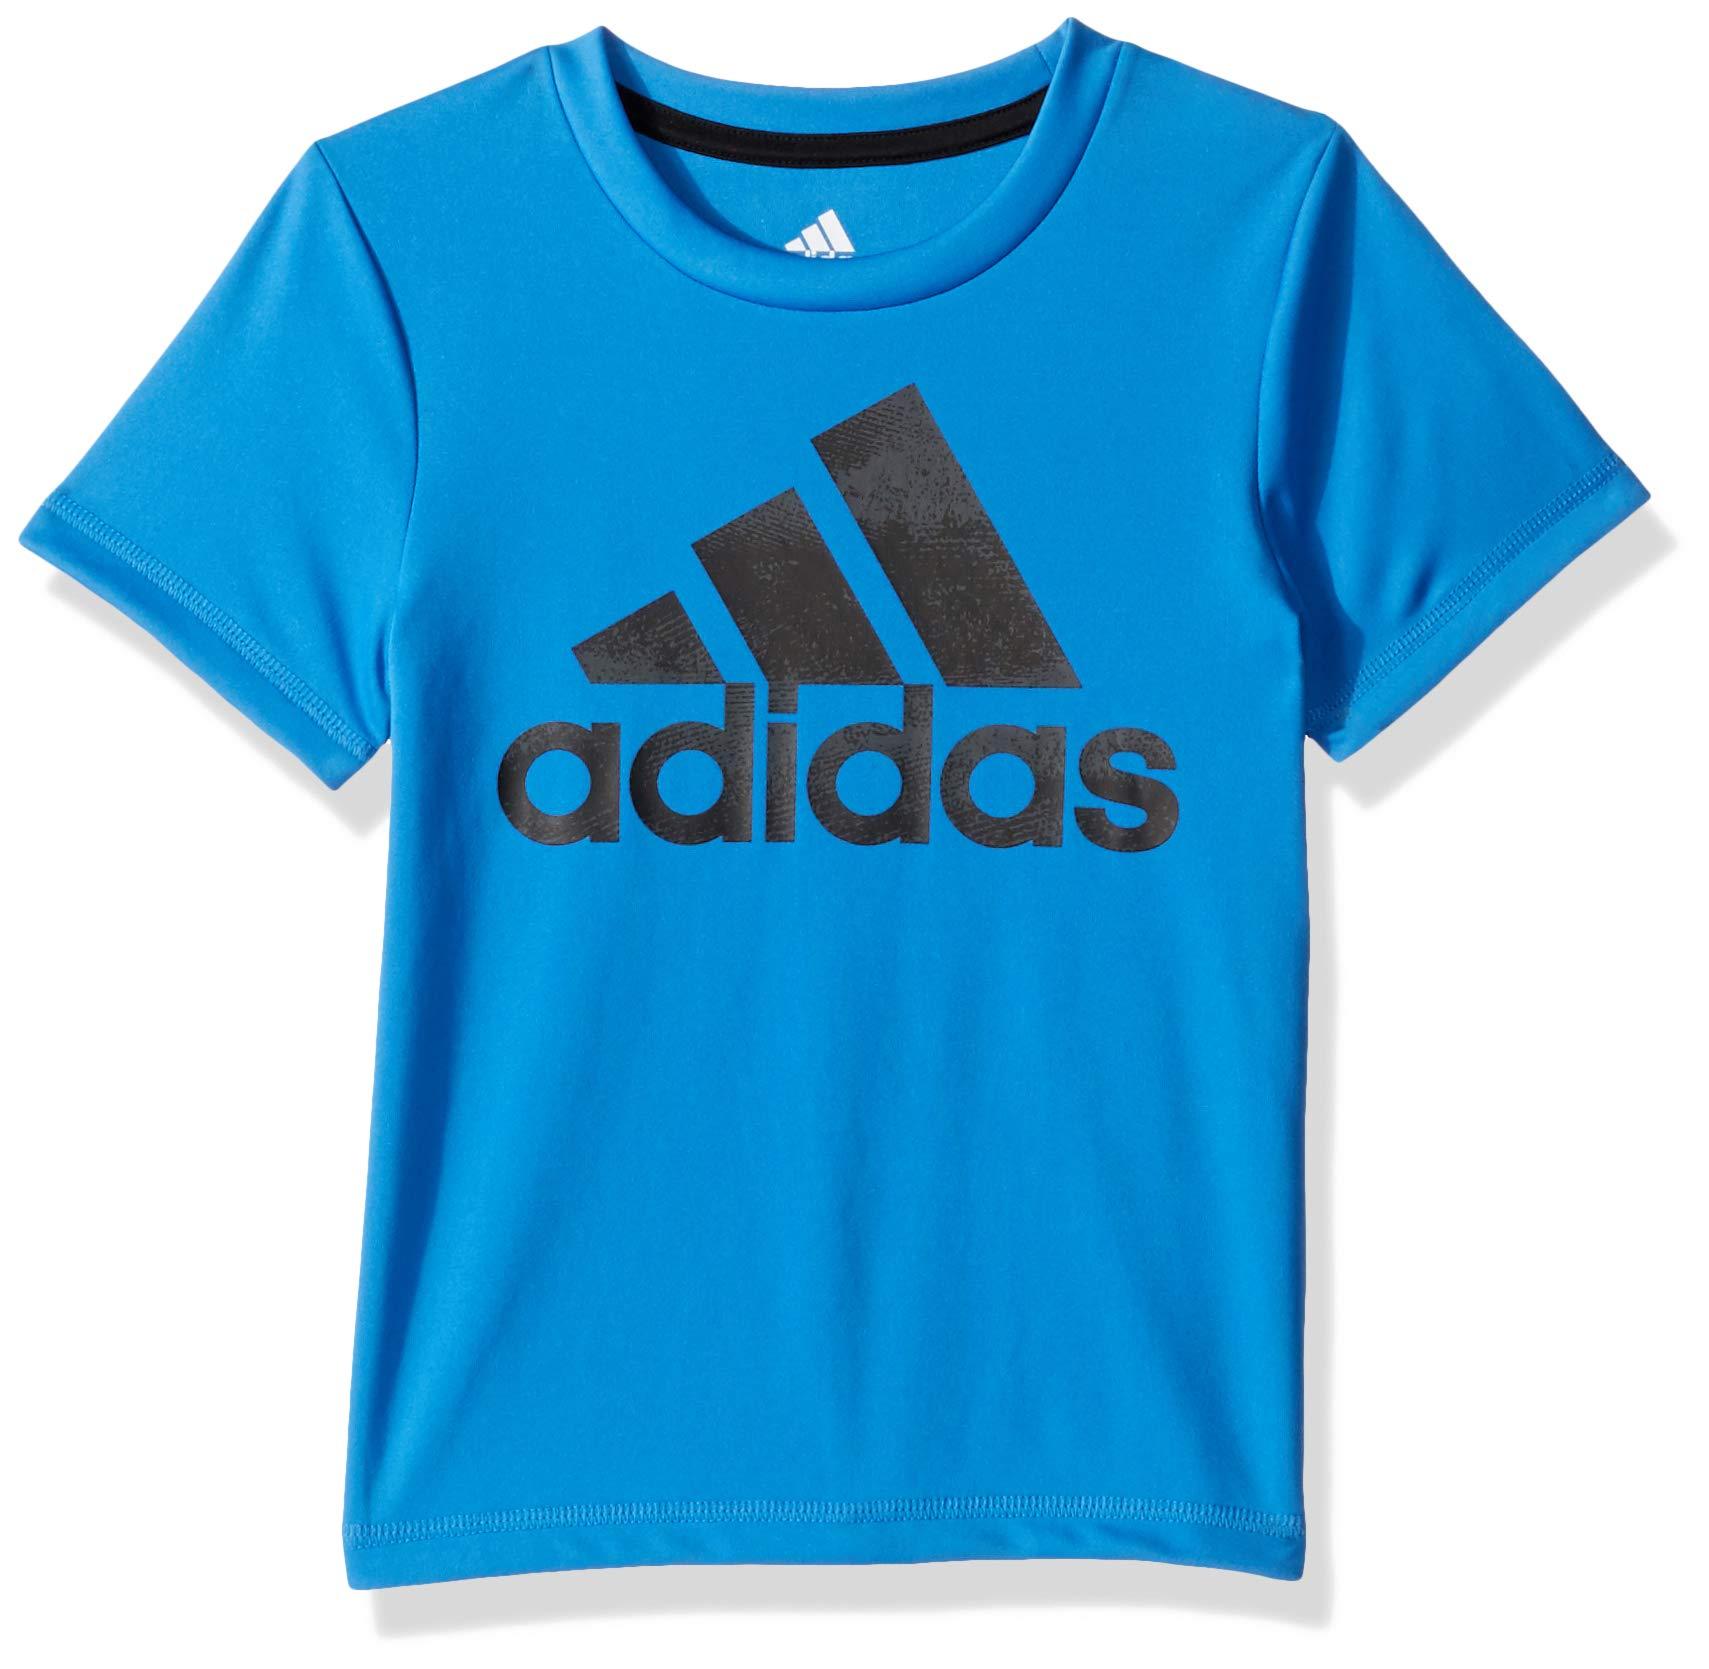 adidas Boys' Toddler Short Sleeve Logo Tee Shirt, Fusion ADI Dark Blue 3T